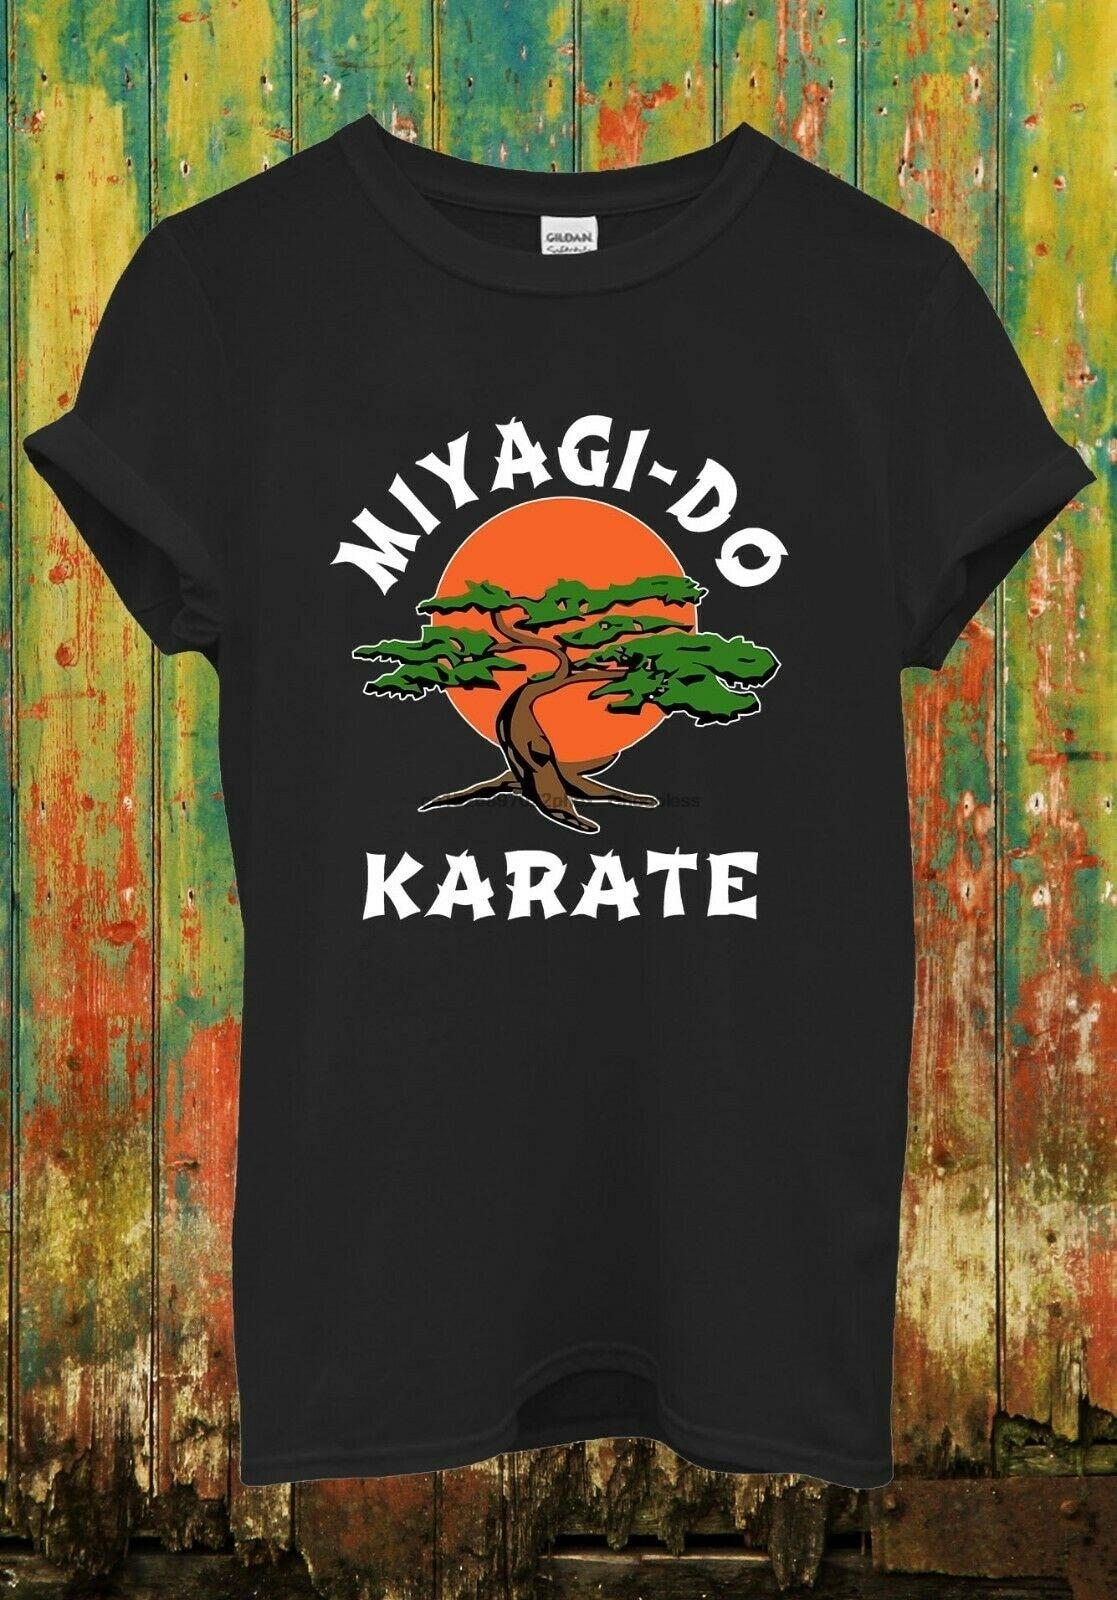 Каратэ-Пацан MIYAGI-DO 80 Ретро Винтаж Для мужчин Для женщин Для мужчин Топ Футболка унисекс 2649